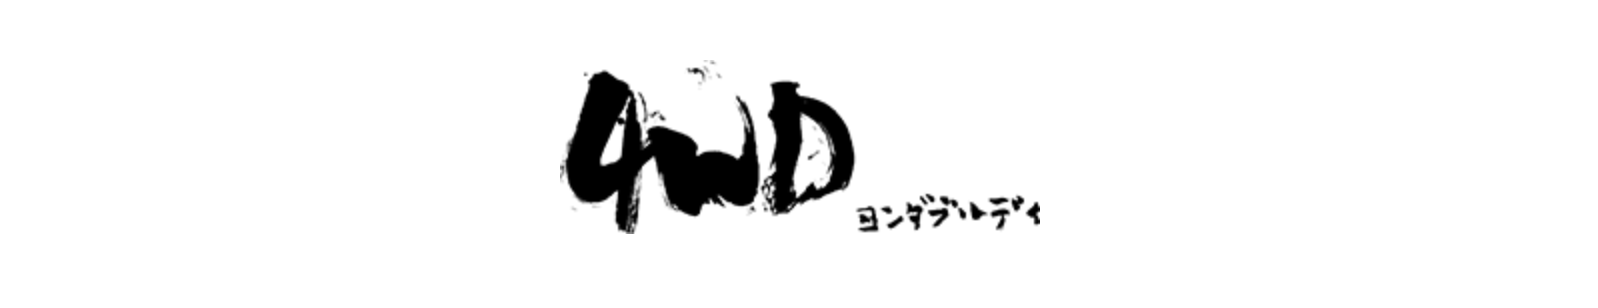 4WD-ヨンダブルディ-